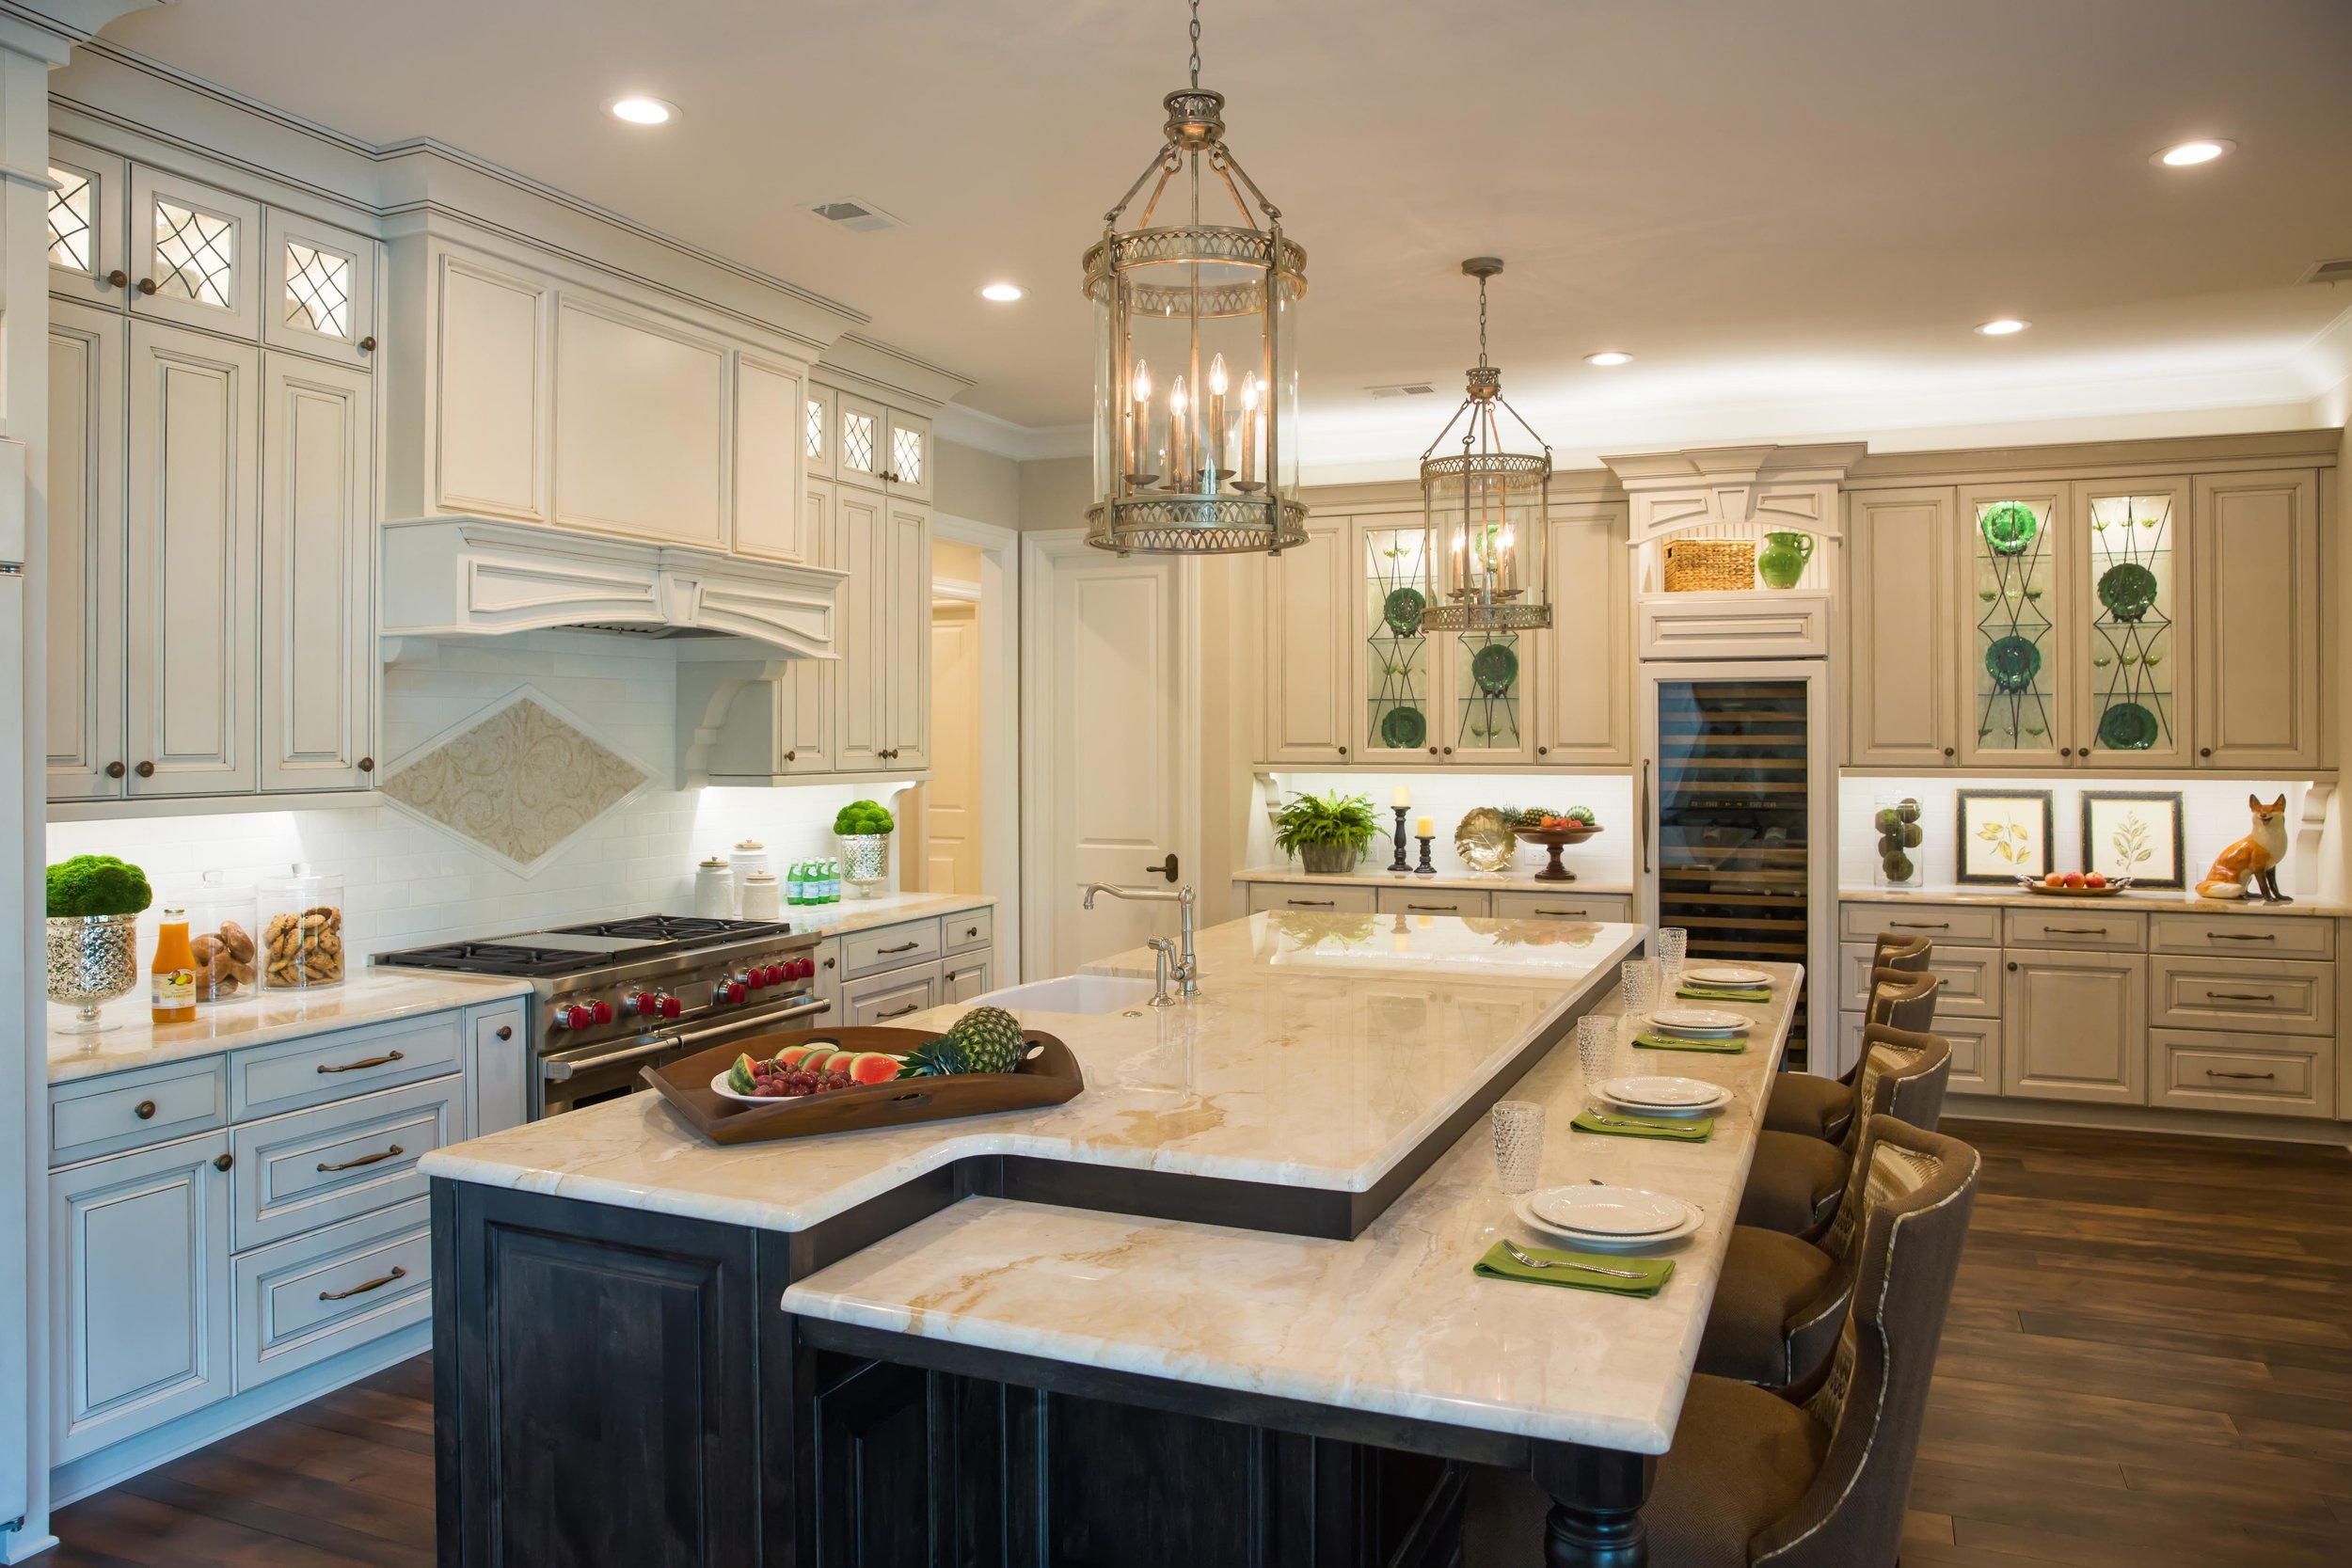 Luxury home kitchen lantern pendants quartzite counters Wolf range wood hood